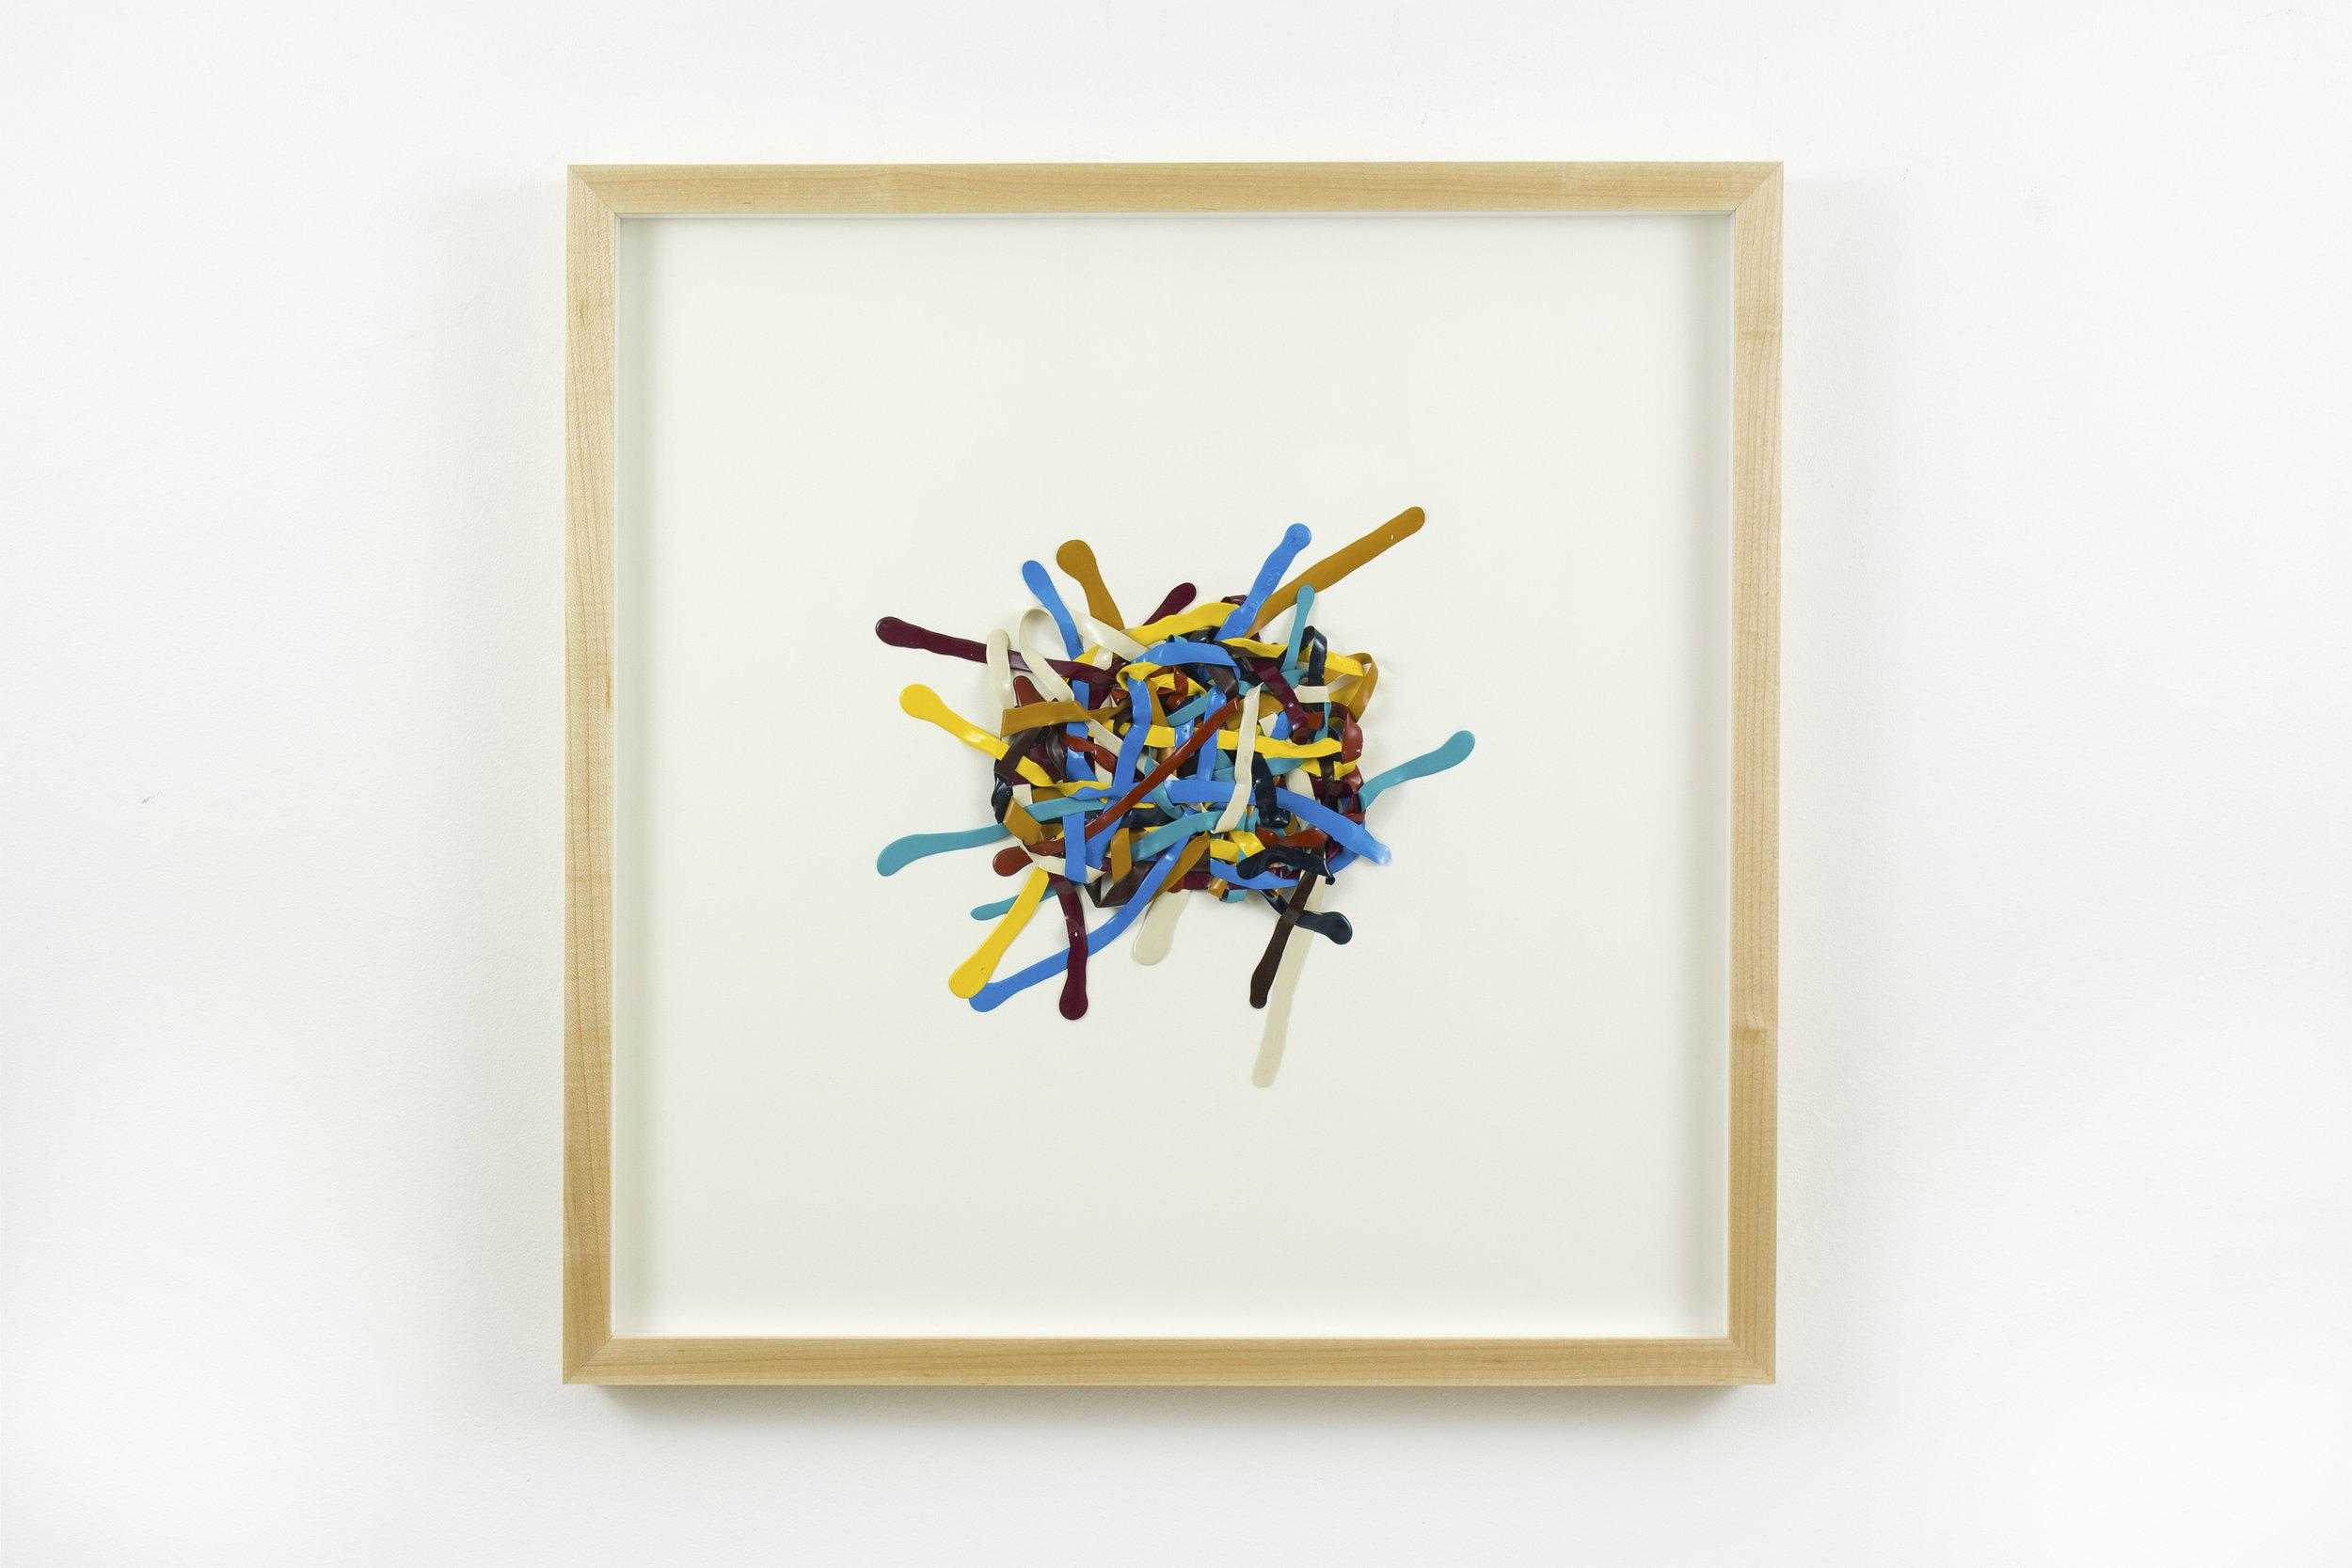 1st Reticulum , acrylic on paper, 2017, 20 x 20in | 50 x 50cm